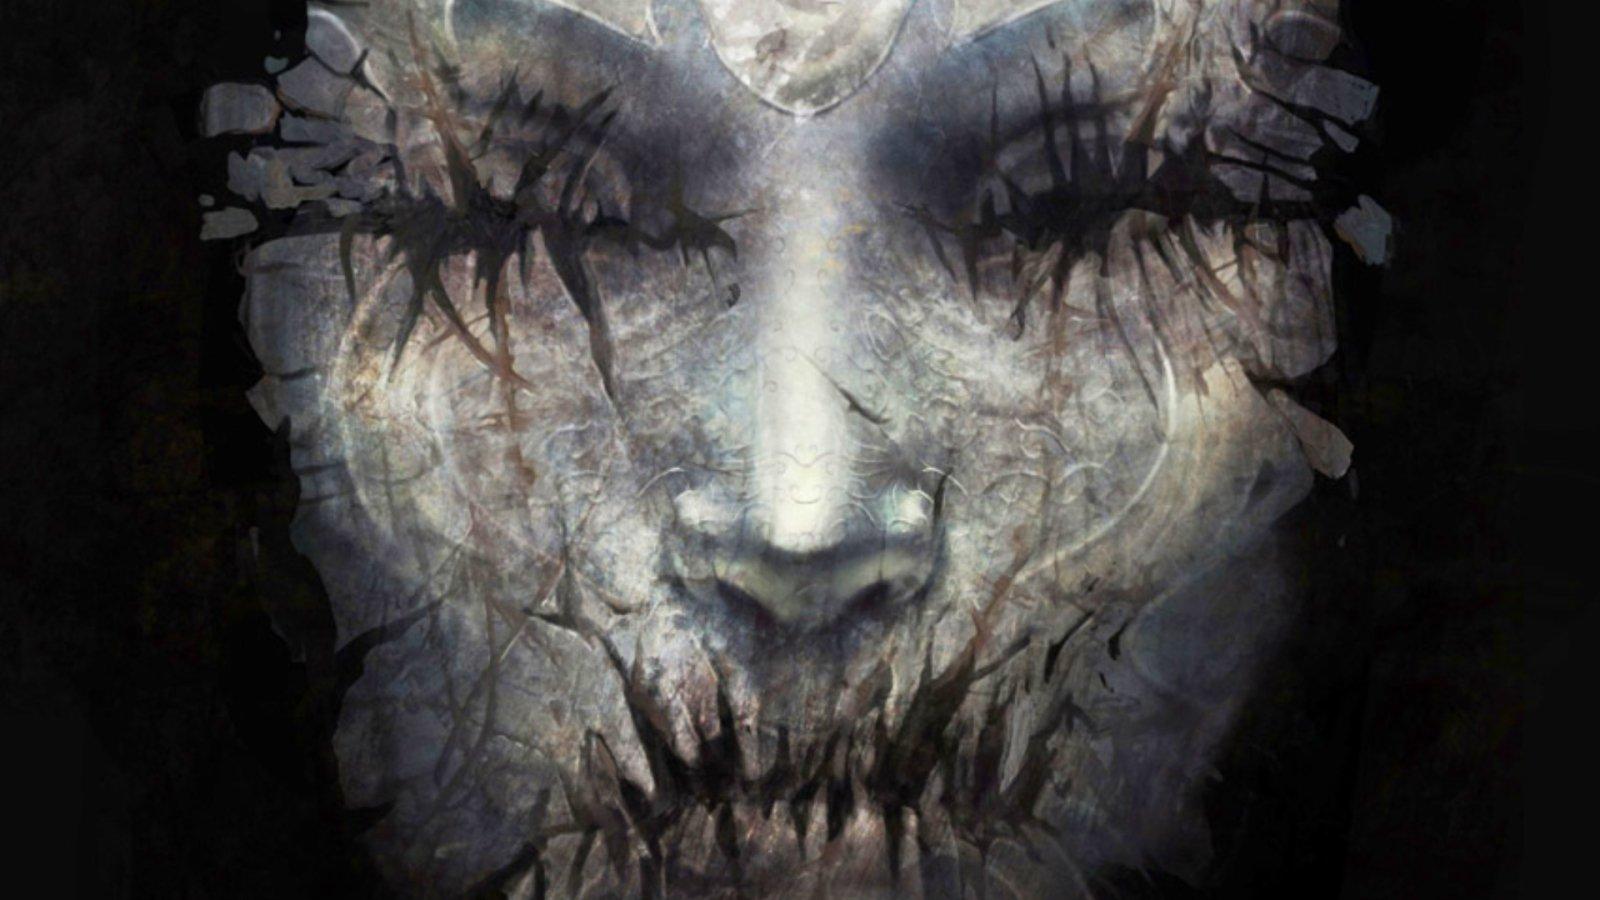 dark art artwork fantasy artistic original horror evil